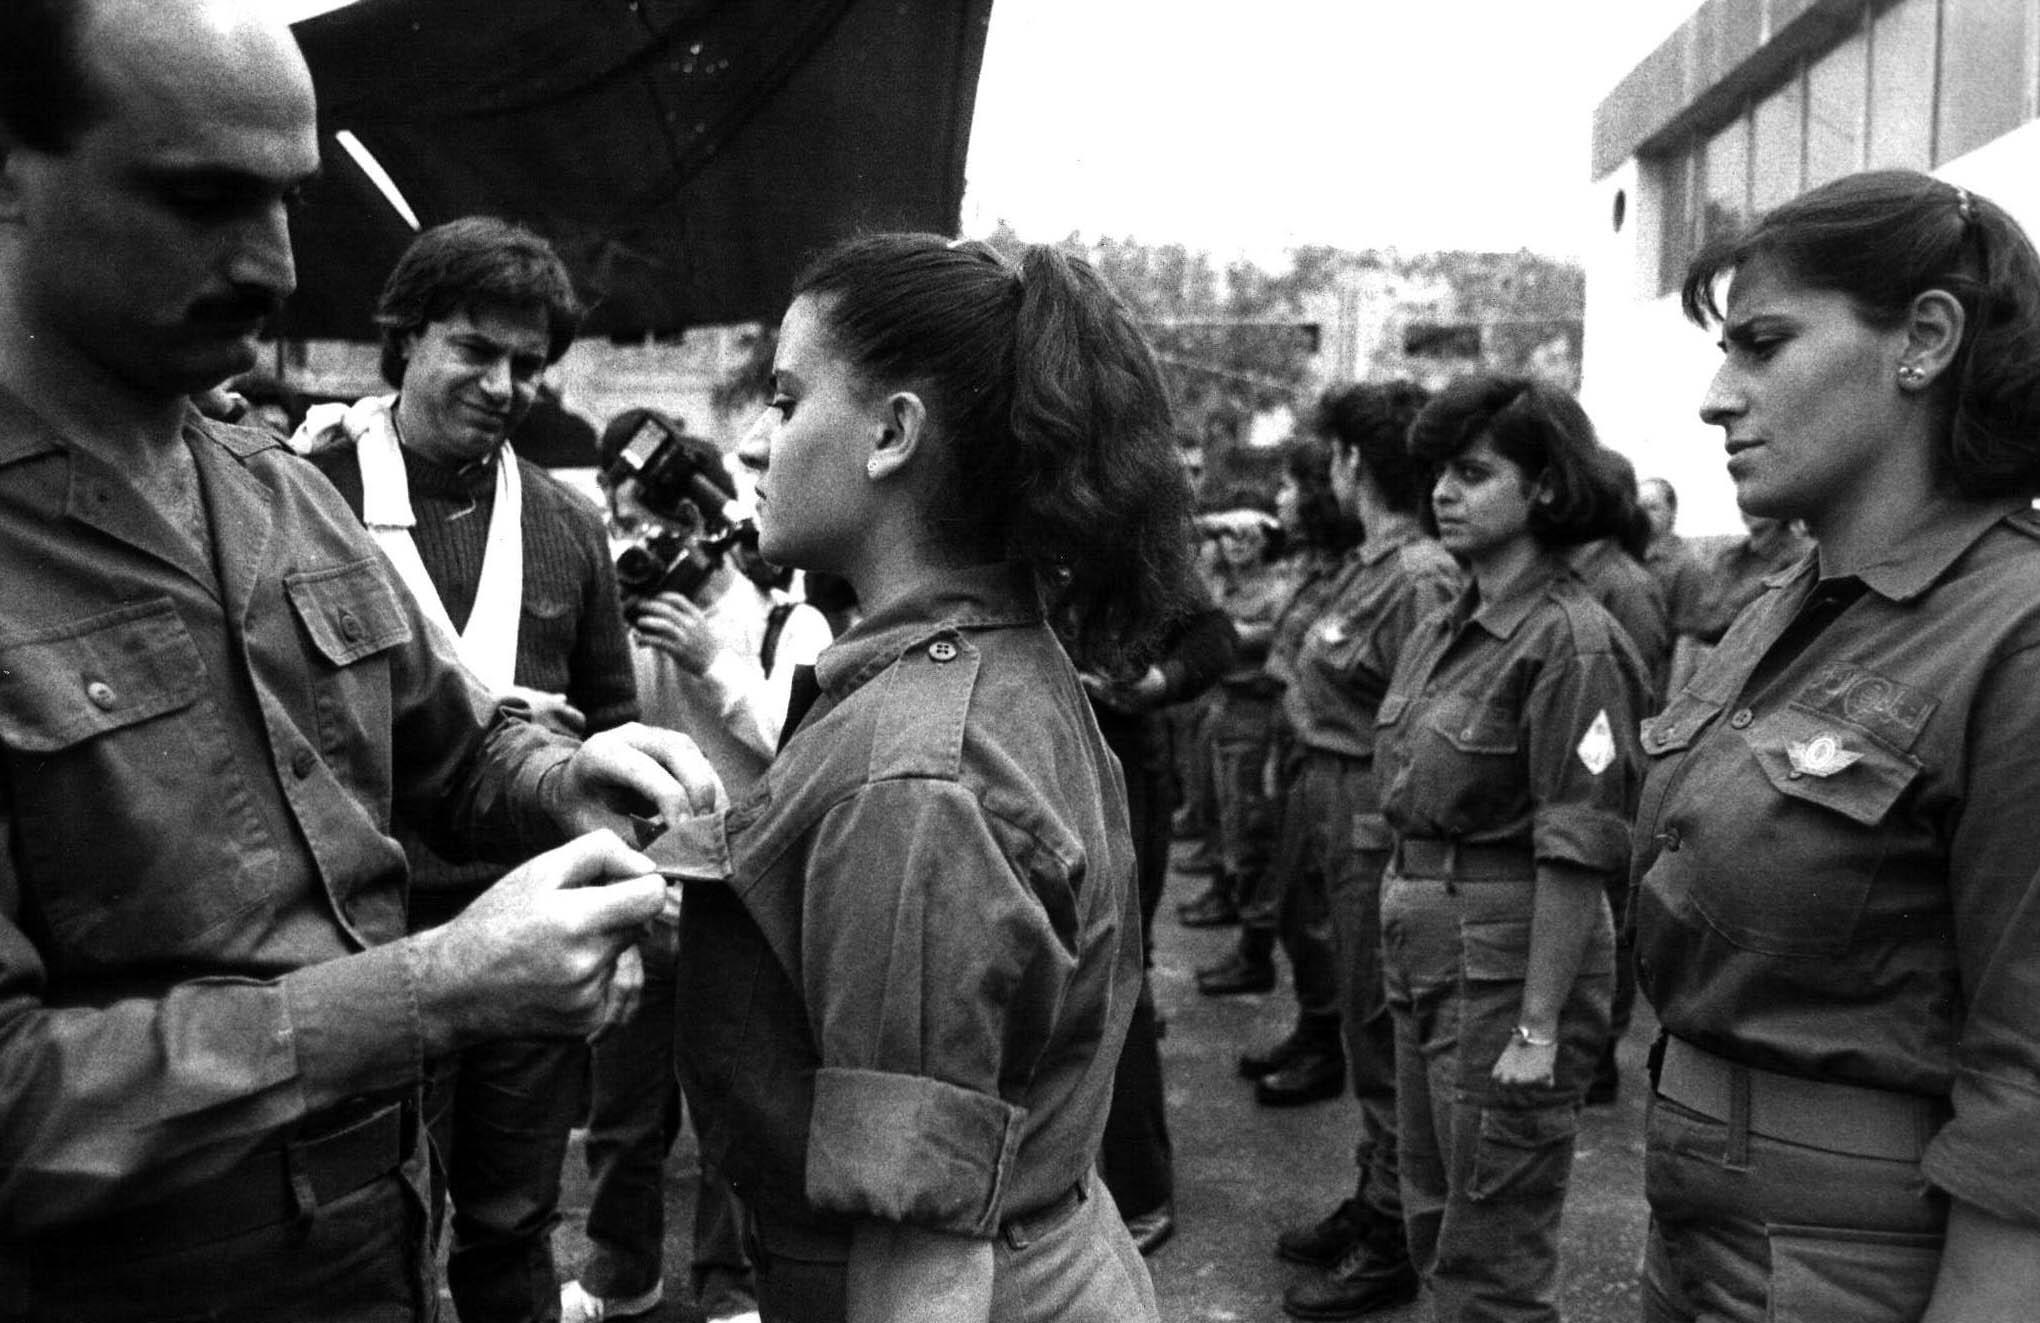 'Never again,' Lebanon says on civil war 40th anniversary